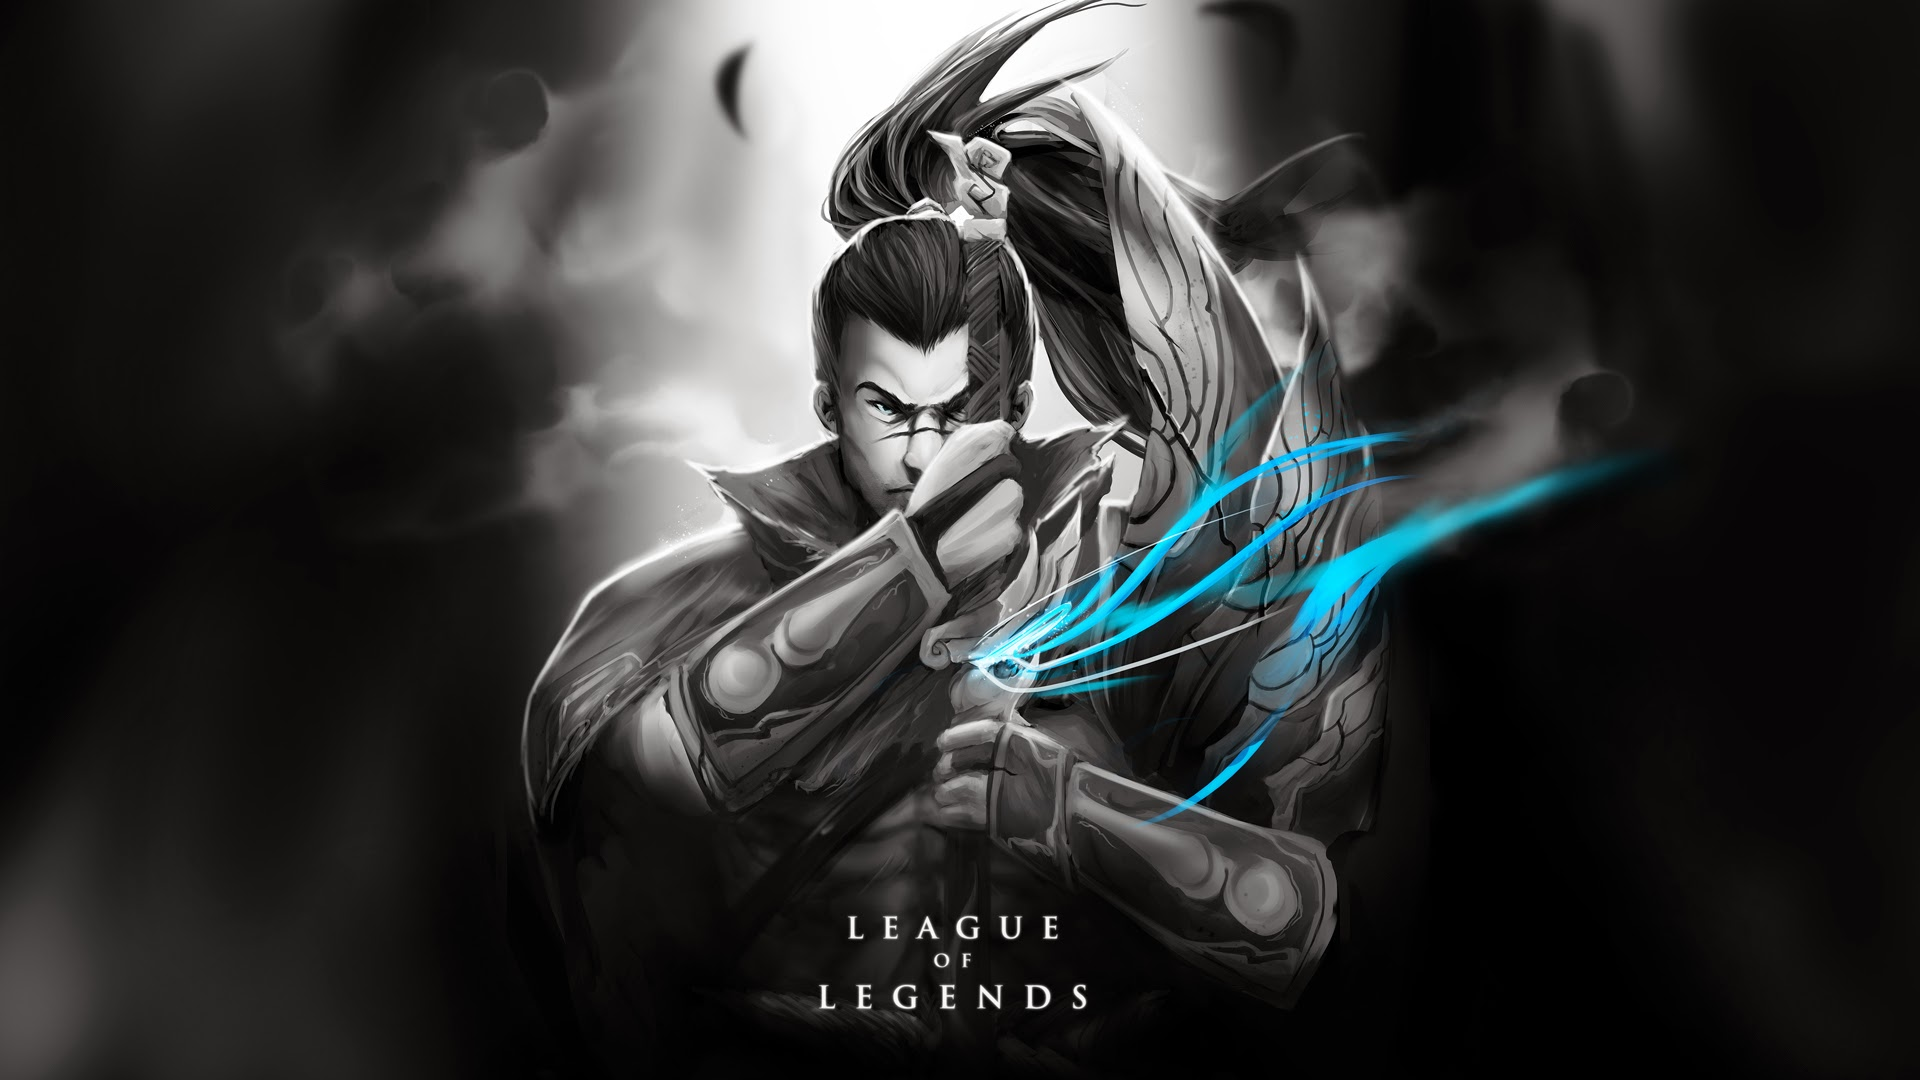 League Of Legends Yasuo Wallpaper: HD League Of Legends Wallpapers